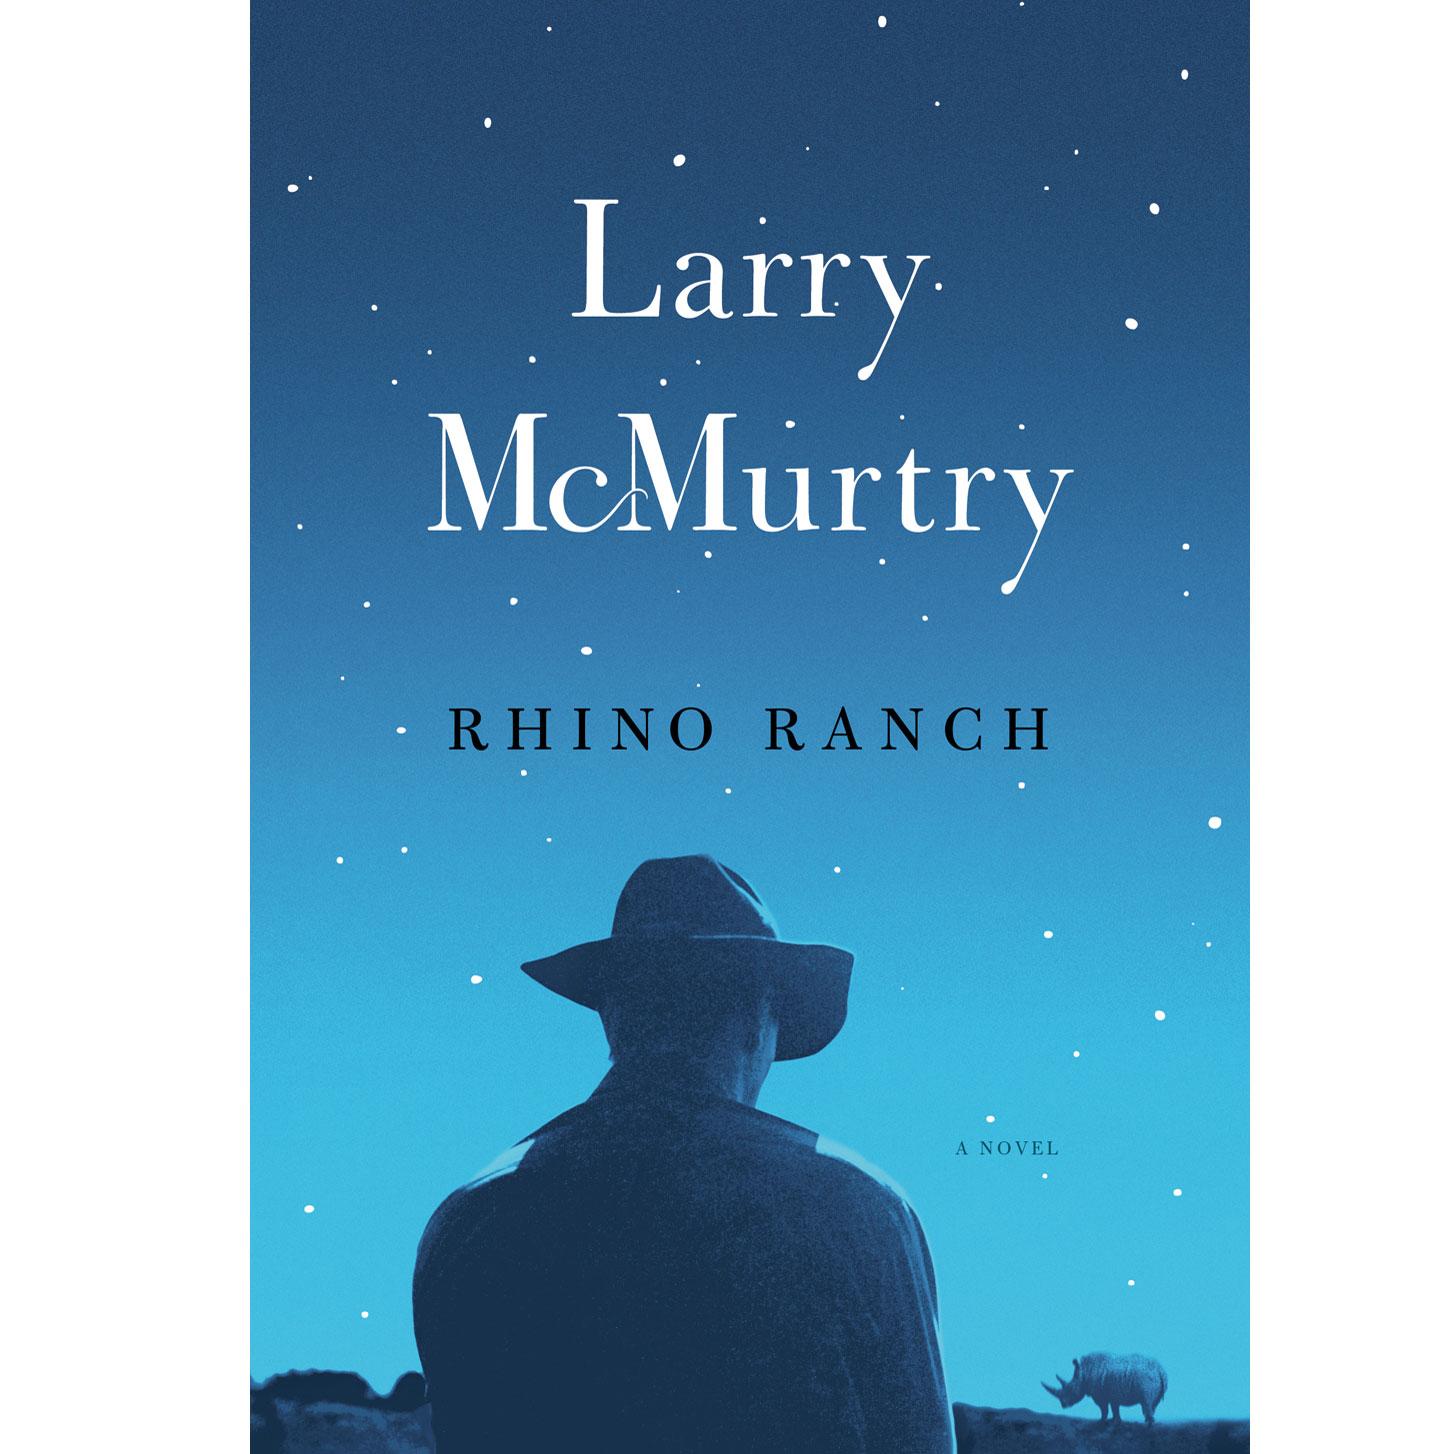 'Rhino' cover